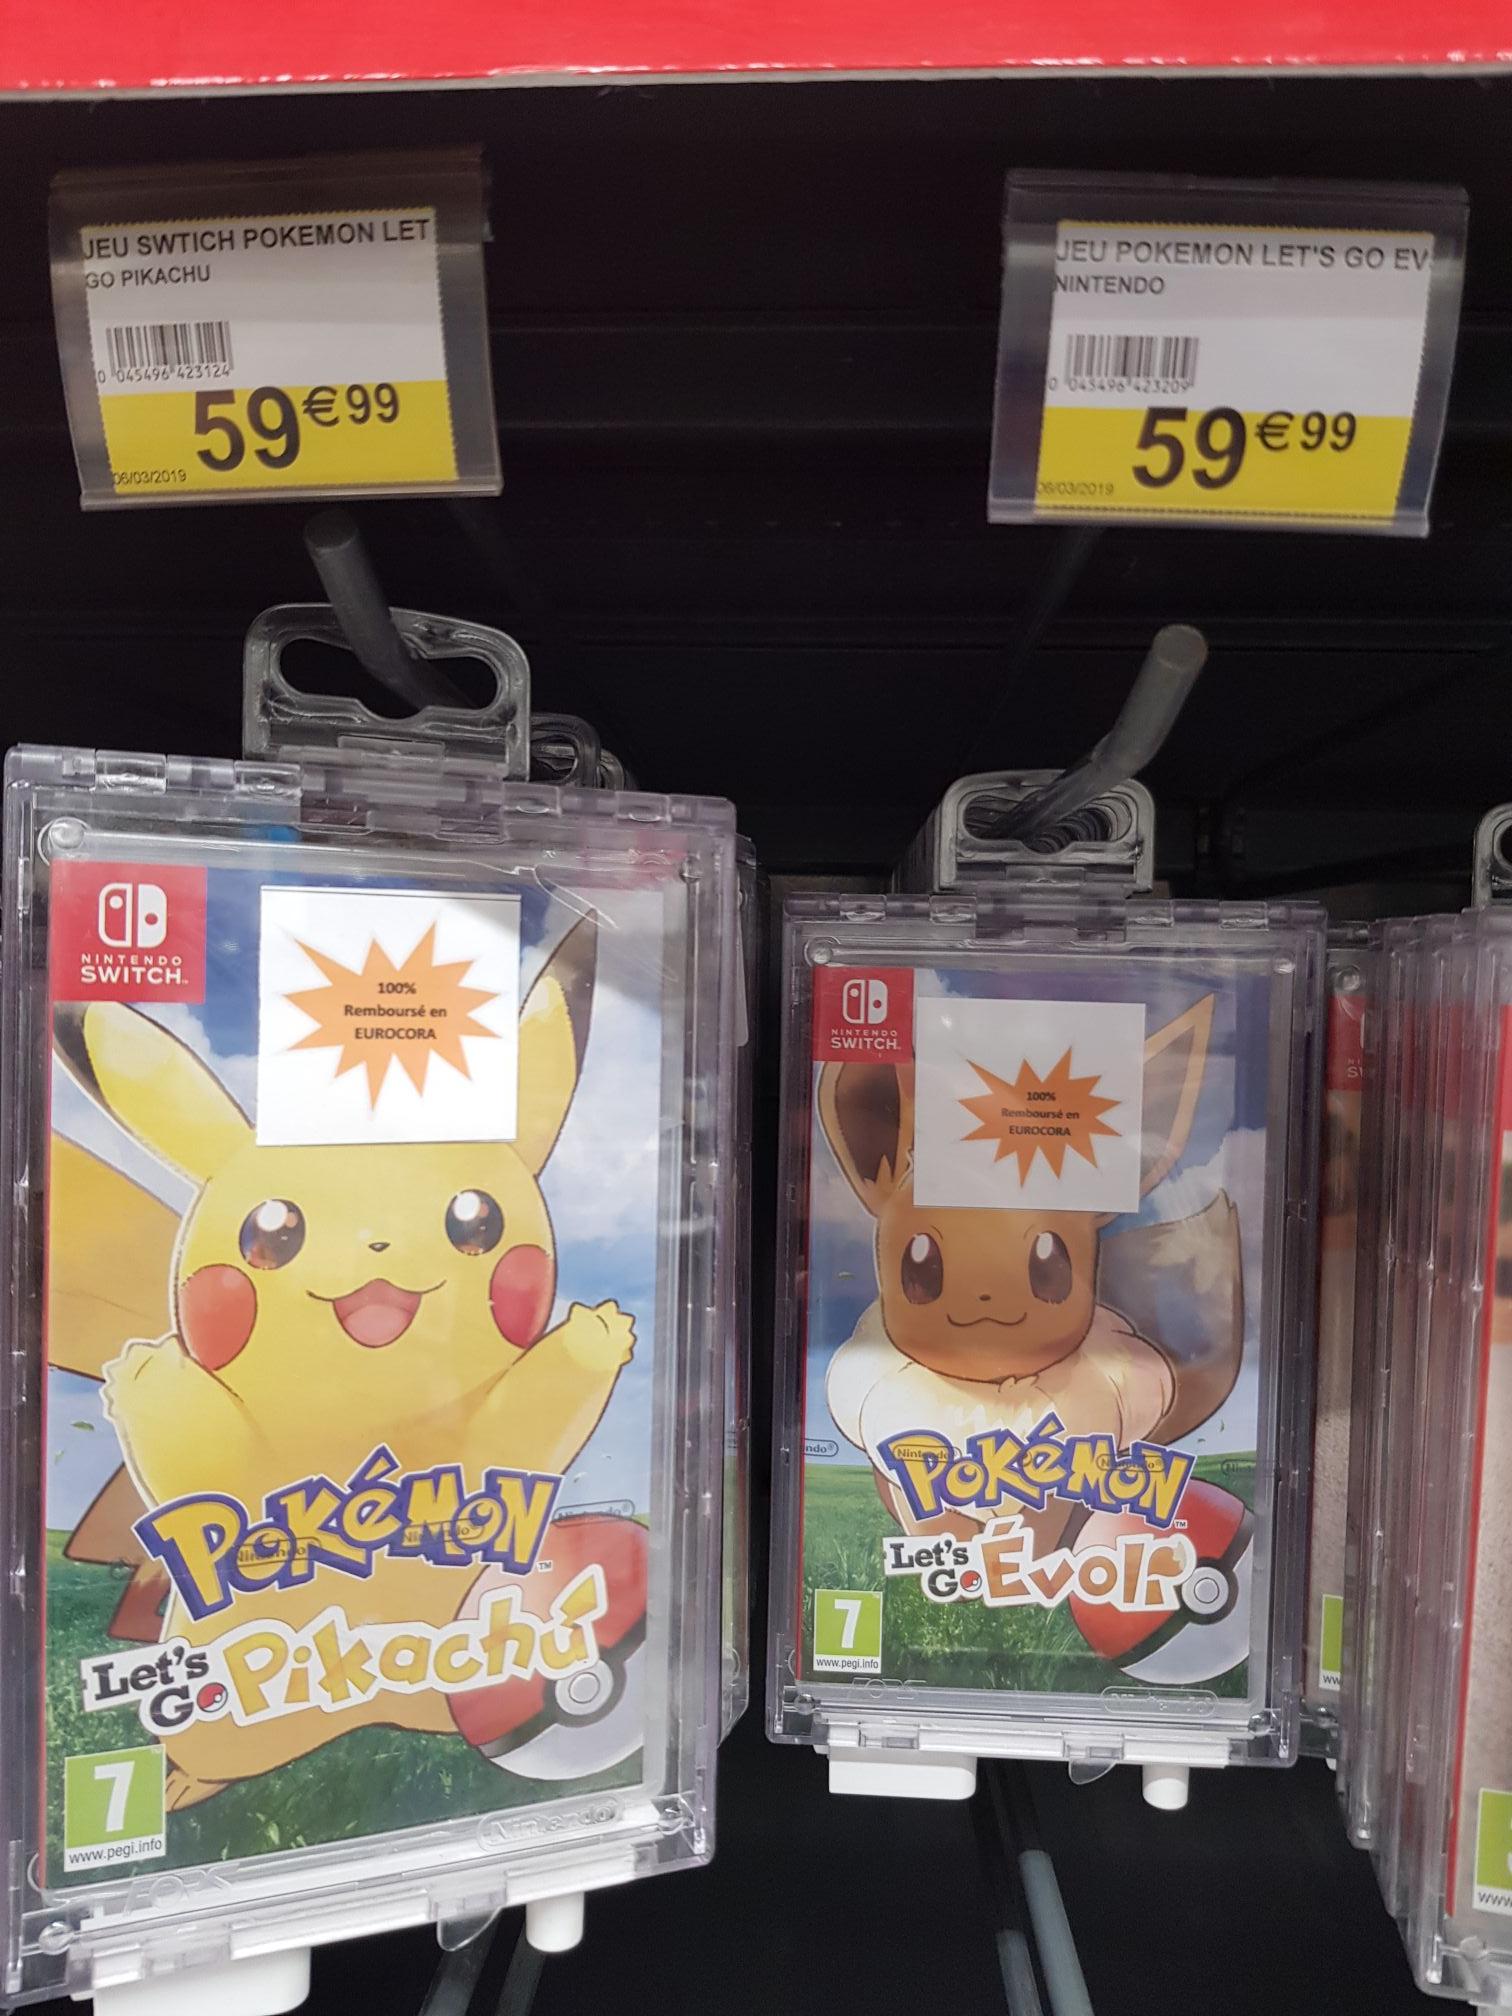 Pokémon: Let's Go - Evoli ou Pikachu sur Switch (via 59.99€ en €uroCora) - Massy (91)